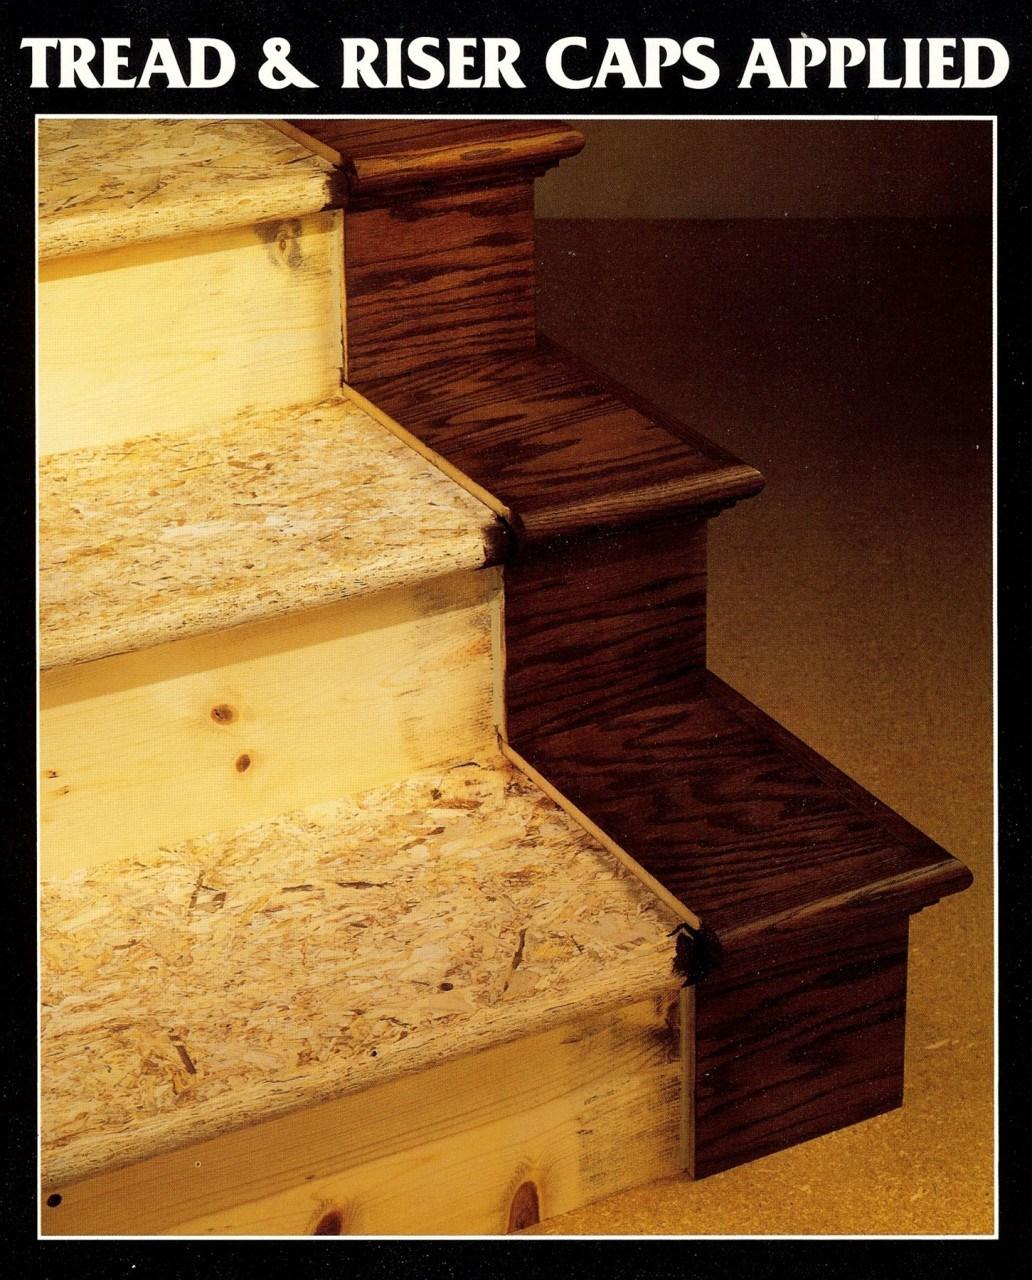 K8971 False Tread Cap Lh Rh Proudly Made In Usa   Oak Stair Tread Caps   Pergo Outlast   Scraped Oak   Riser Kit   Wood   Sp125 4F048C